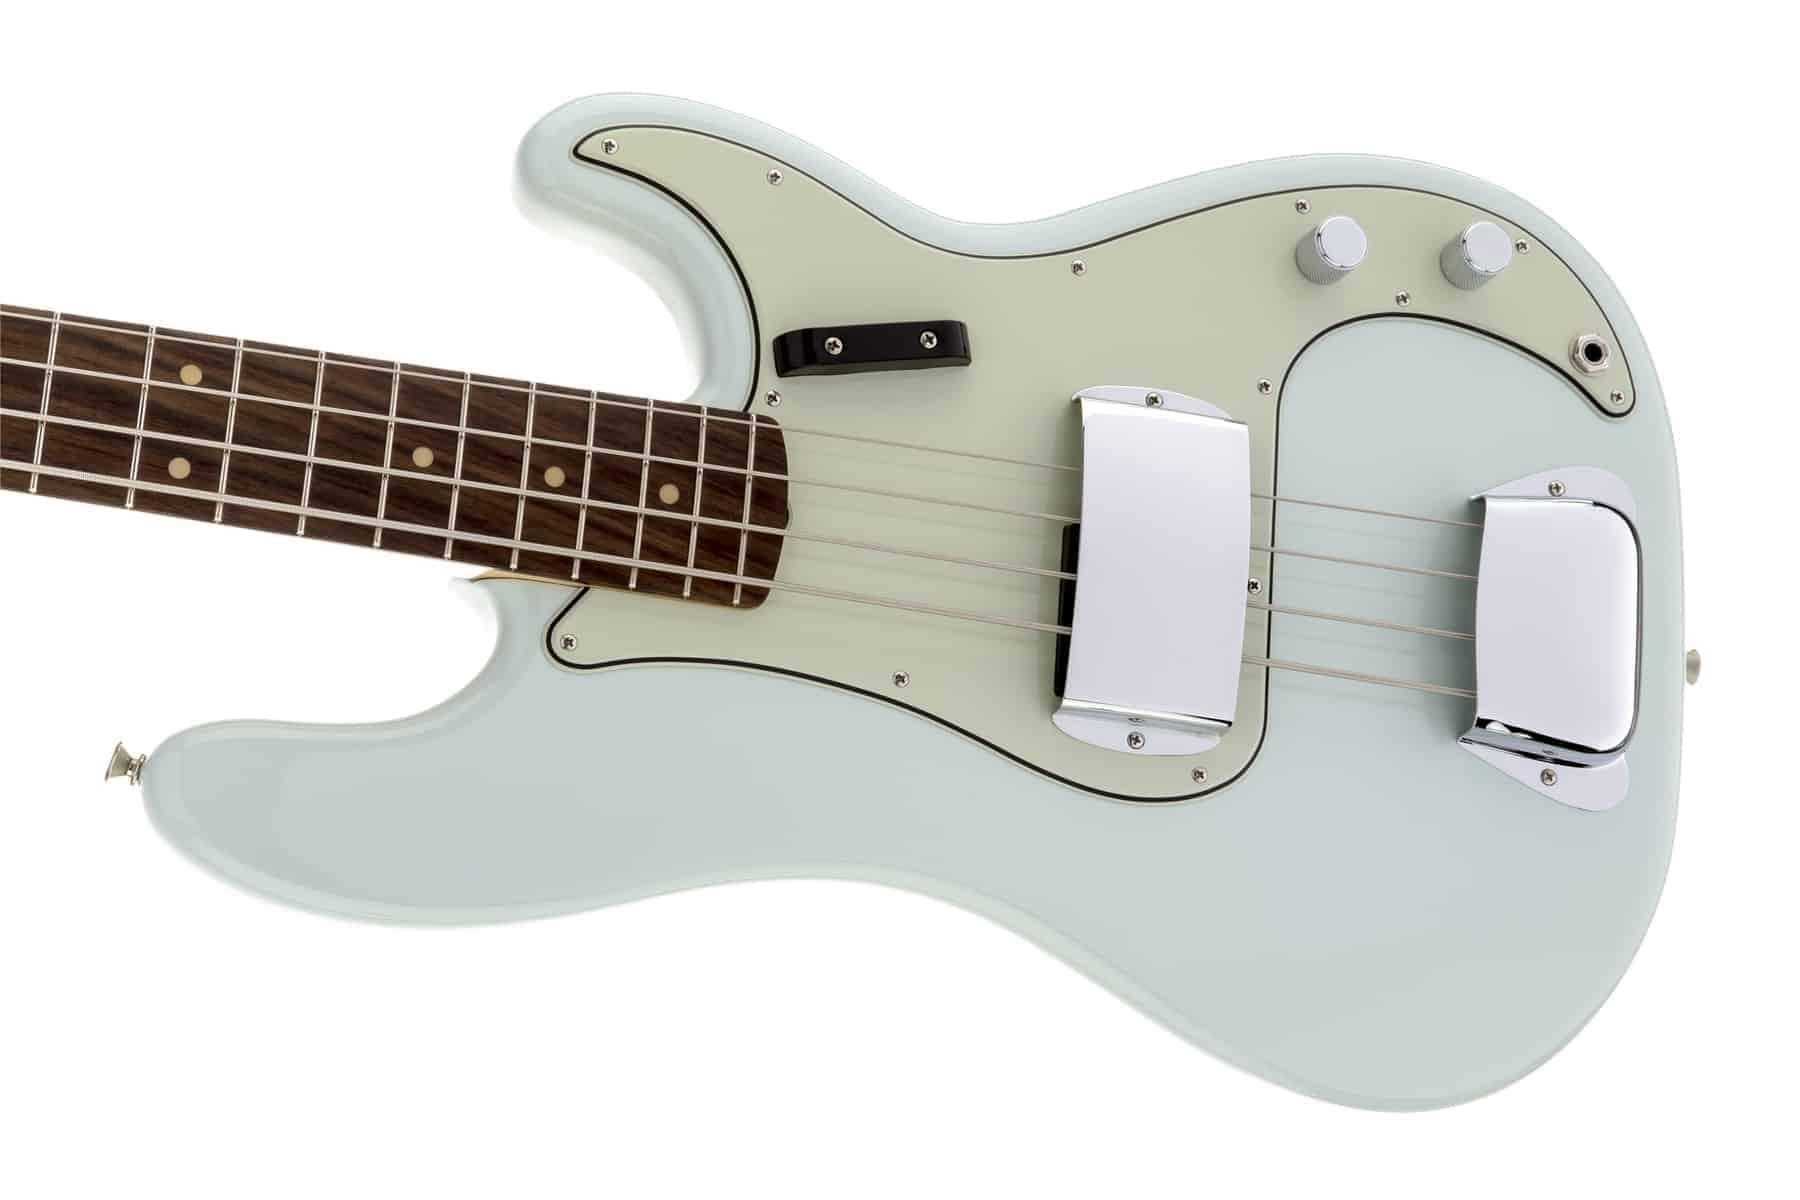 fender precision bass 1963 american vintage sonic blue. Black Bedroom Furniture Sets. Home Design Ideas